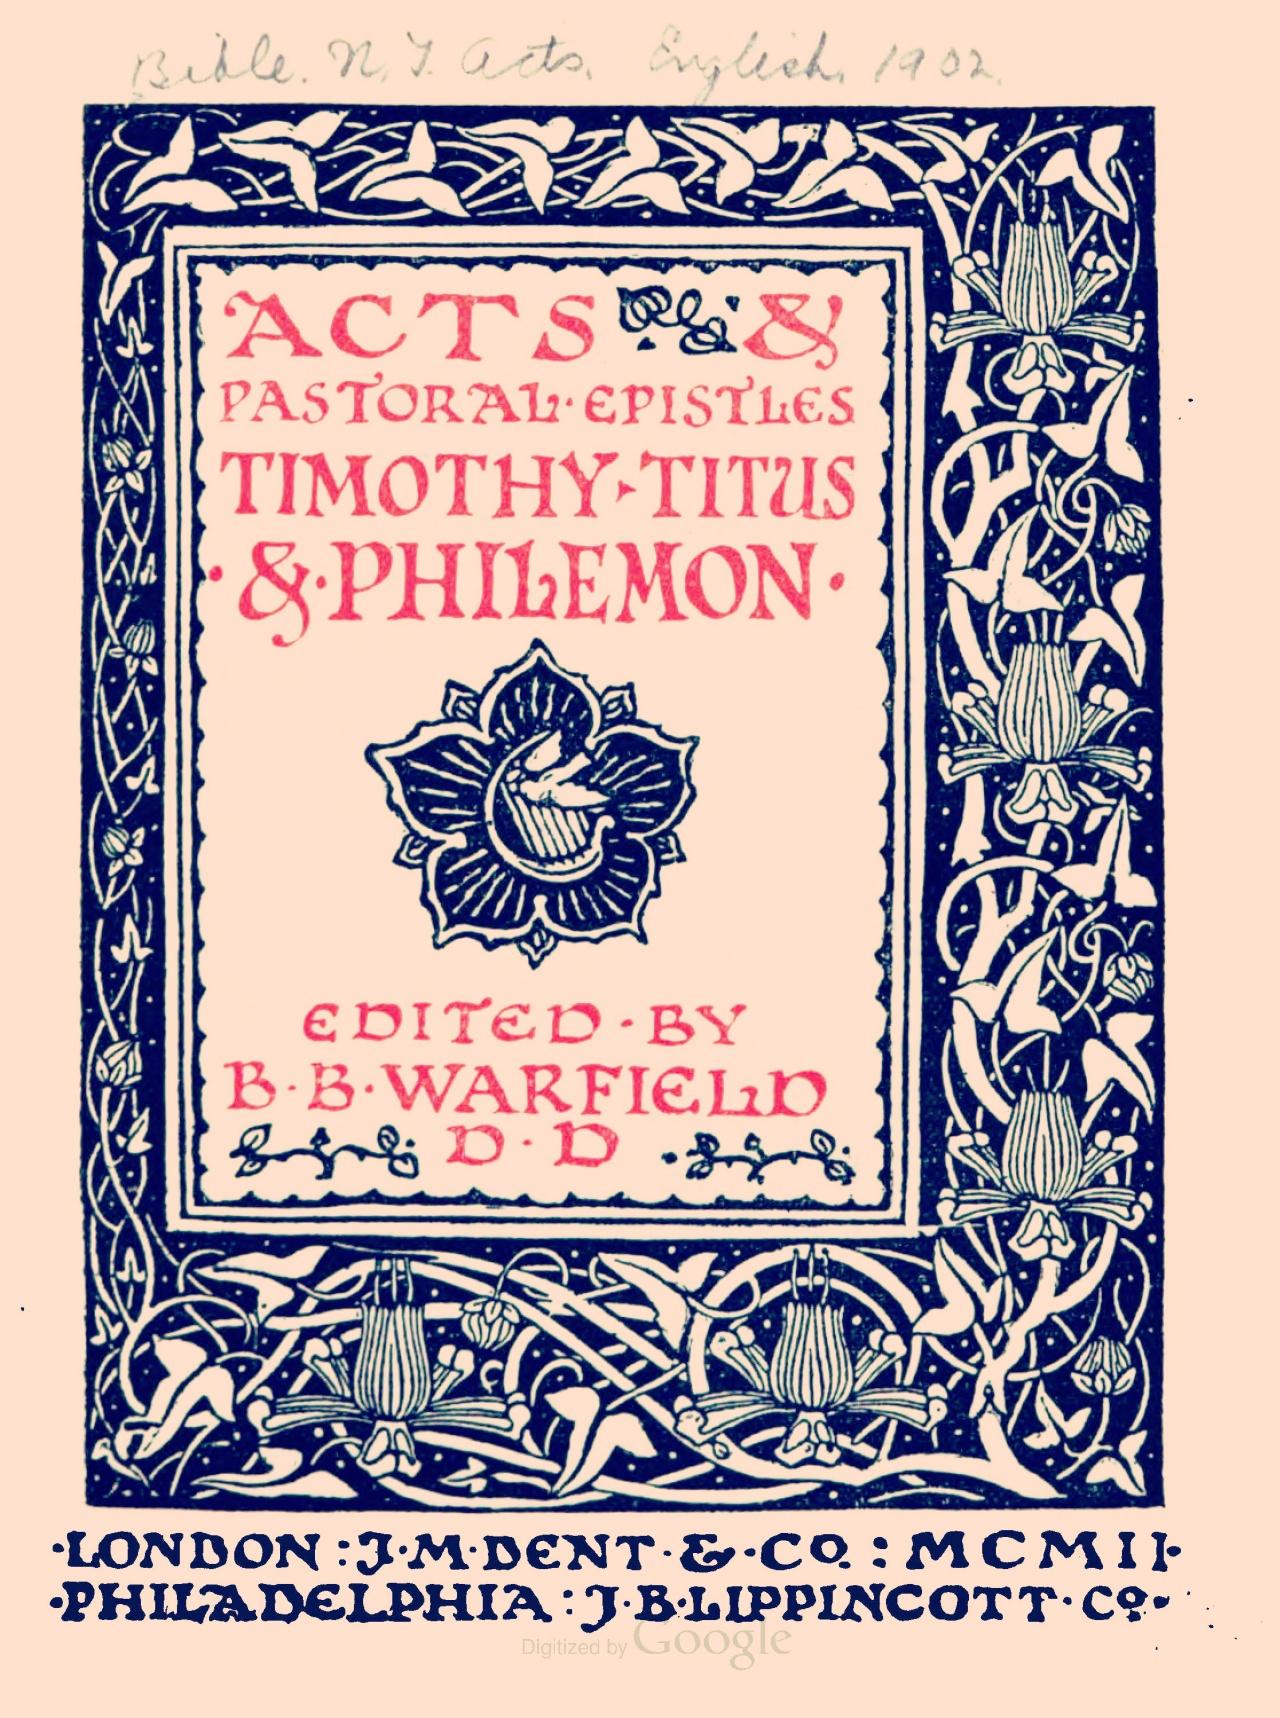 Warfield, Benjamin Breckinridge, Acts & Pastoral Epistles Title Page.jpg